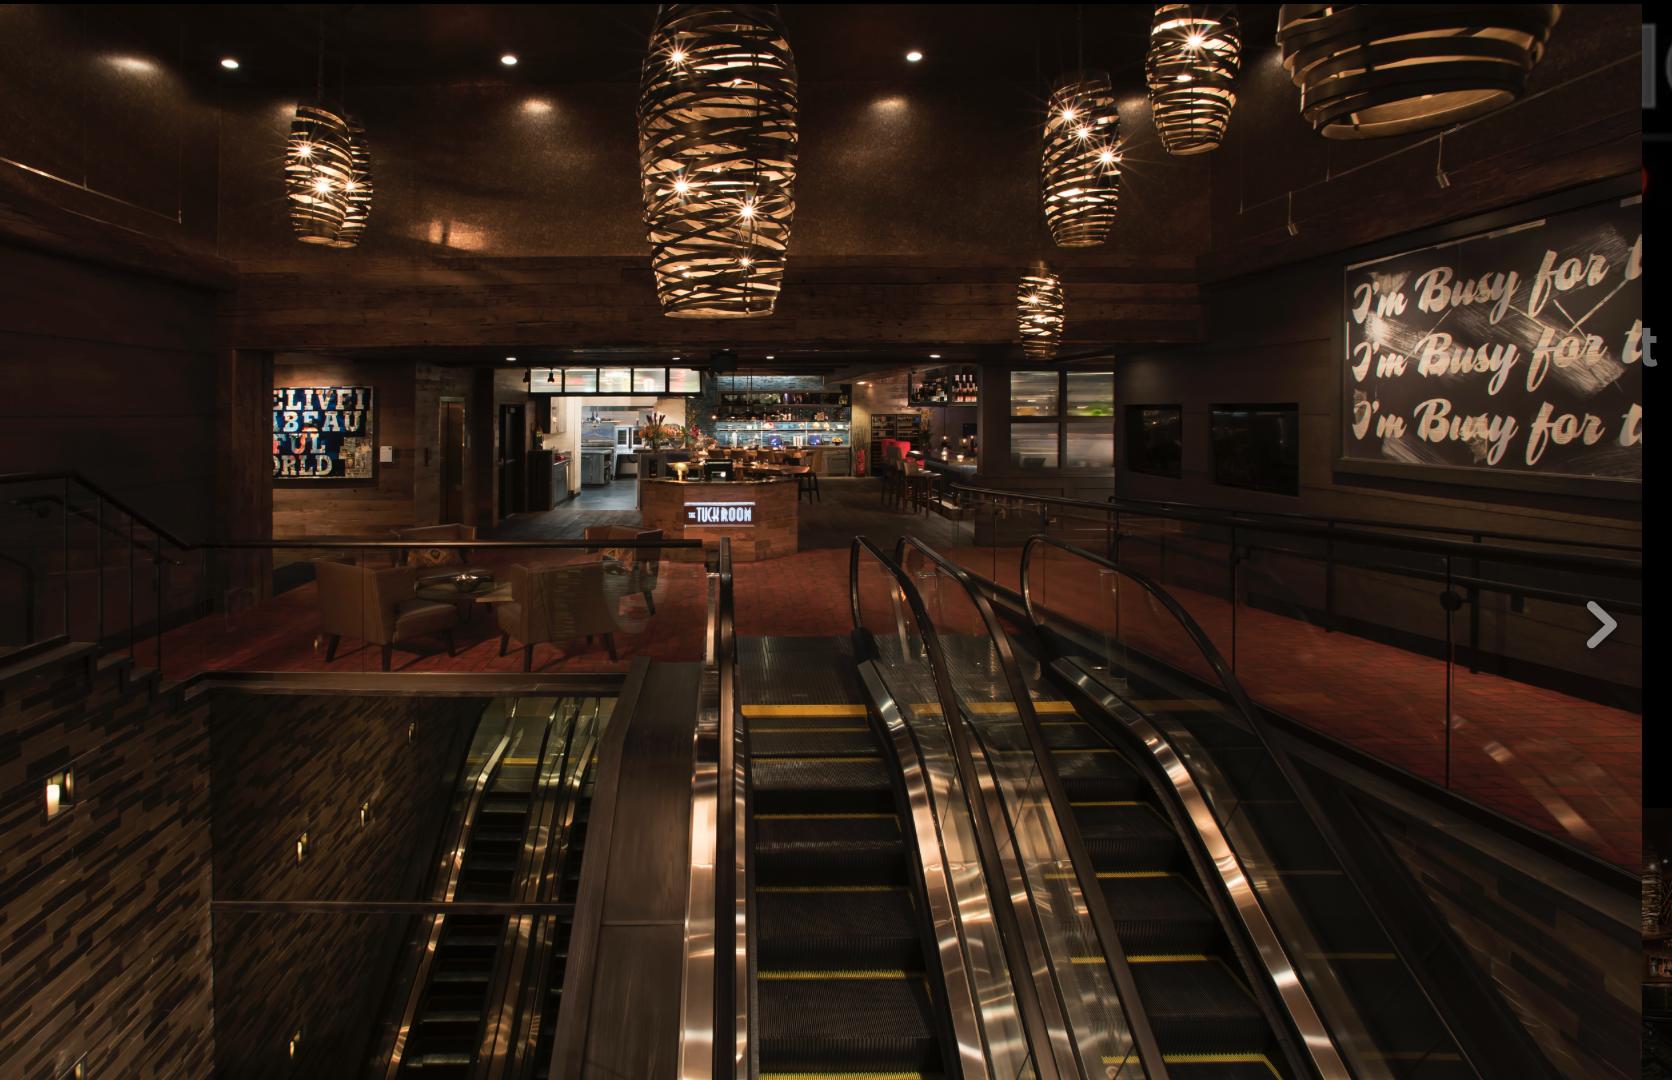 Ipic Theater Houston commissioned by:Karen Hanlon designs